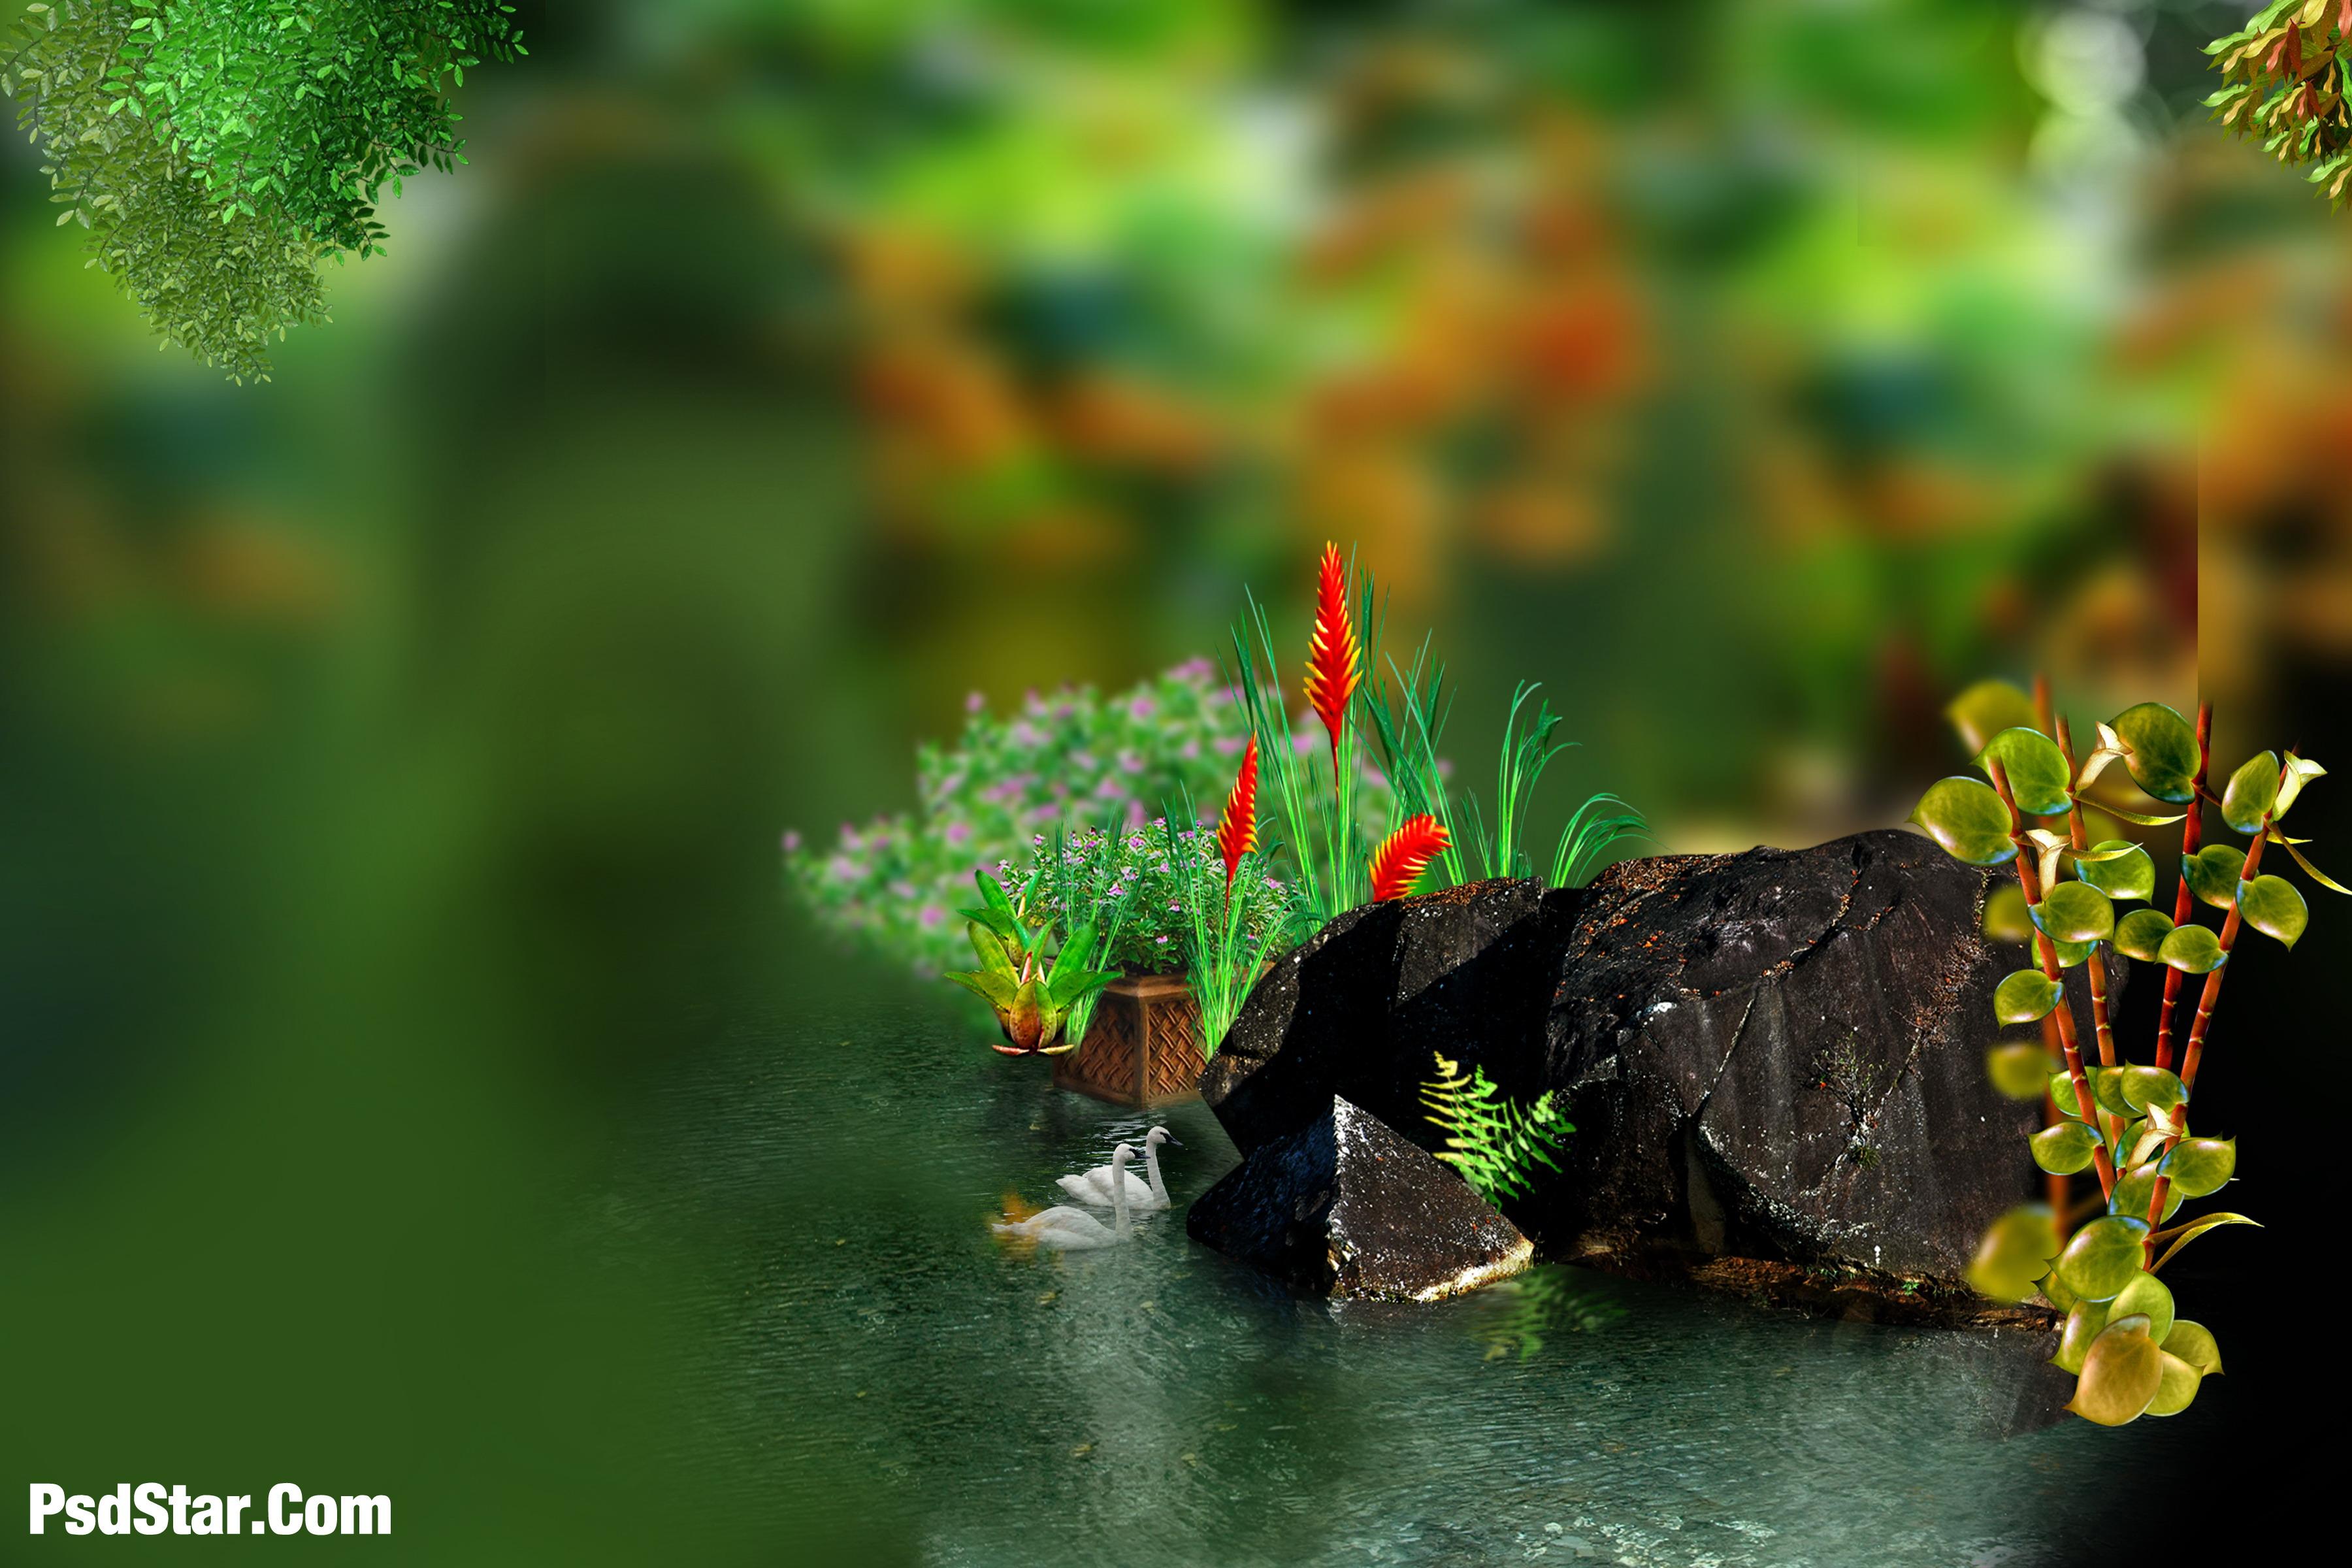 Studio Photography Hd 1080p Wallpapers Wallpaper Cave